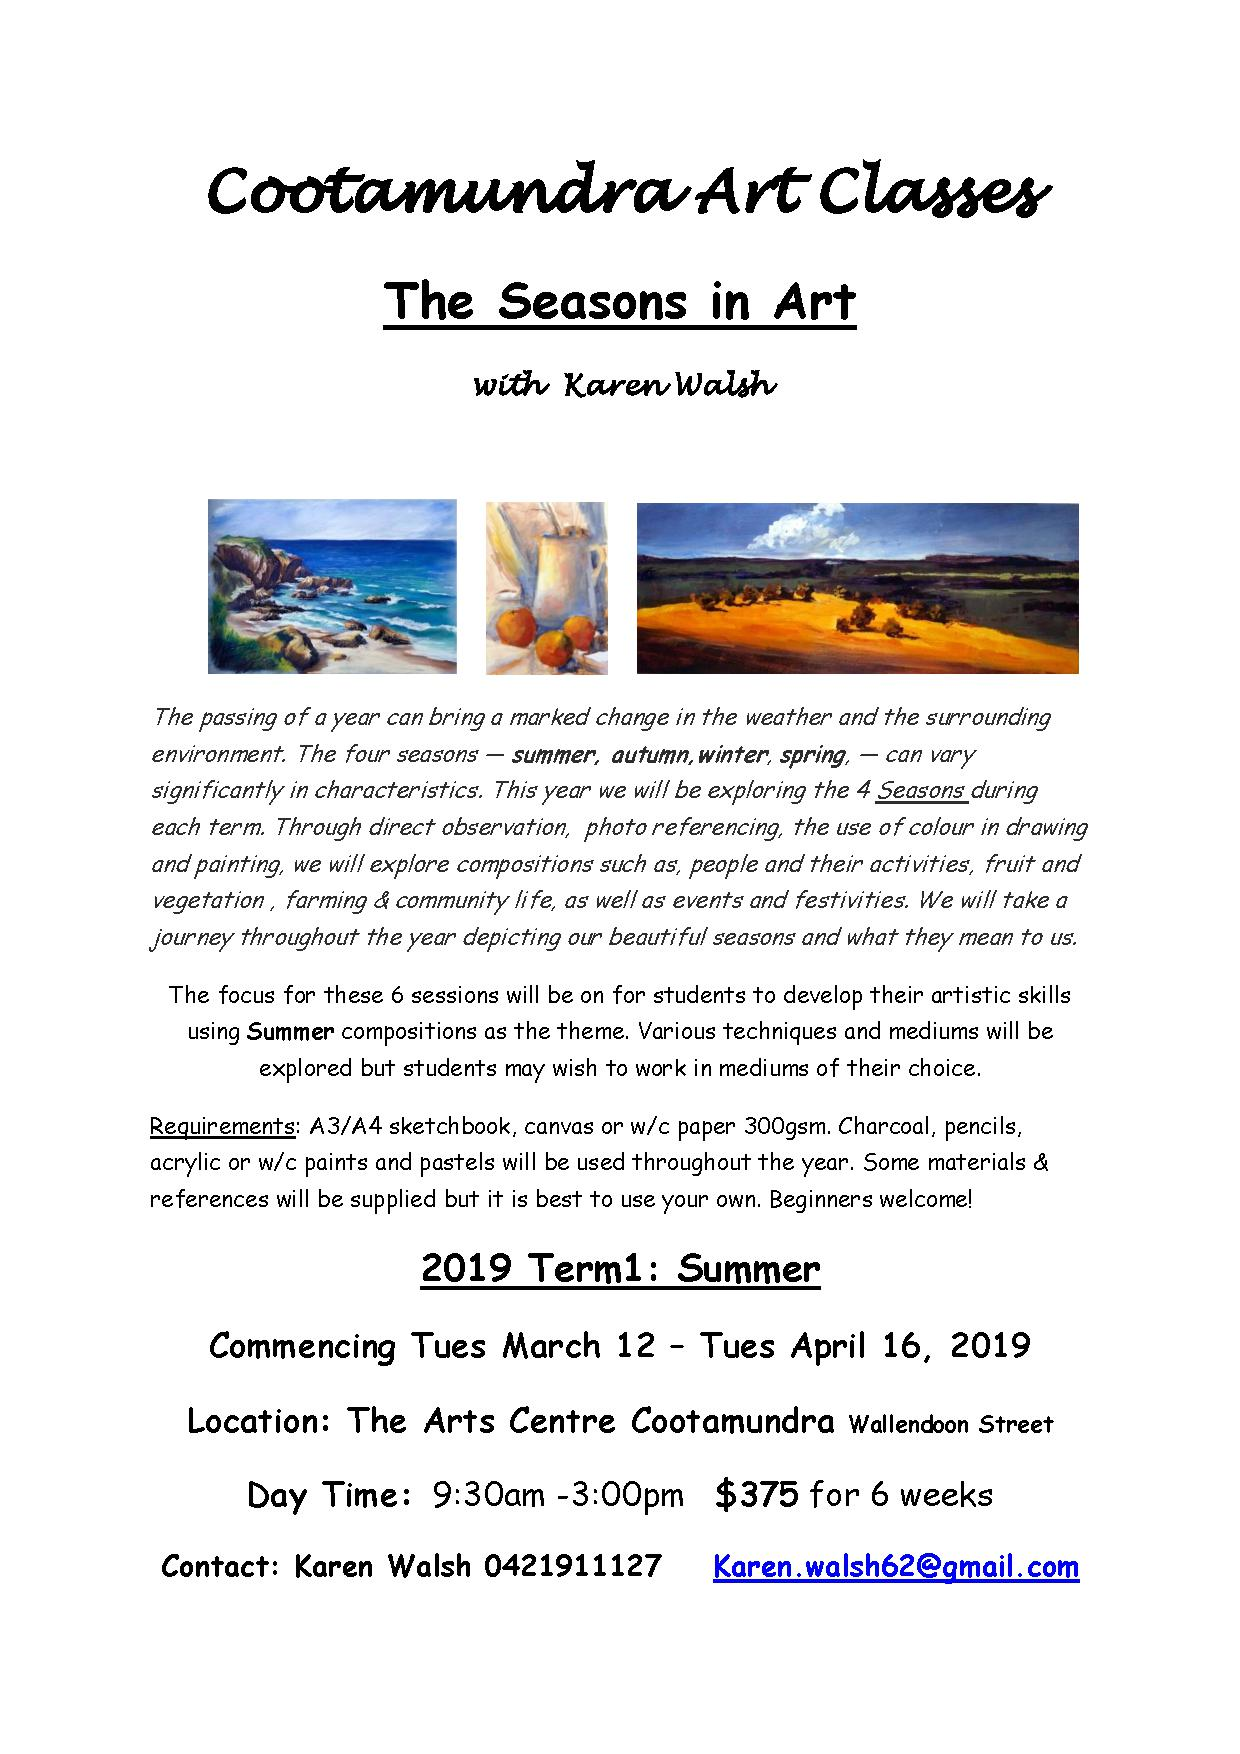 Art Experience  flyer Cootamundra Term 1 2019.jpg